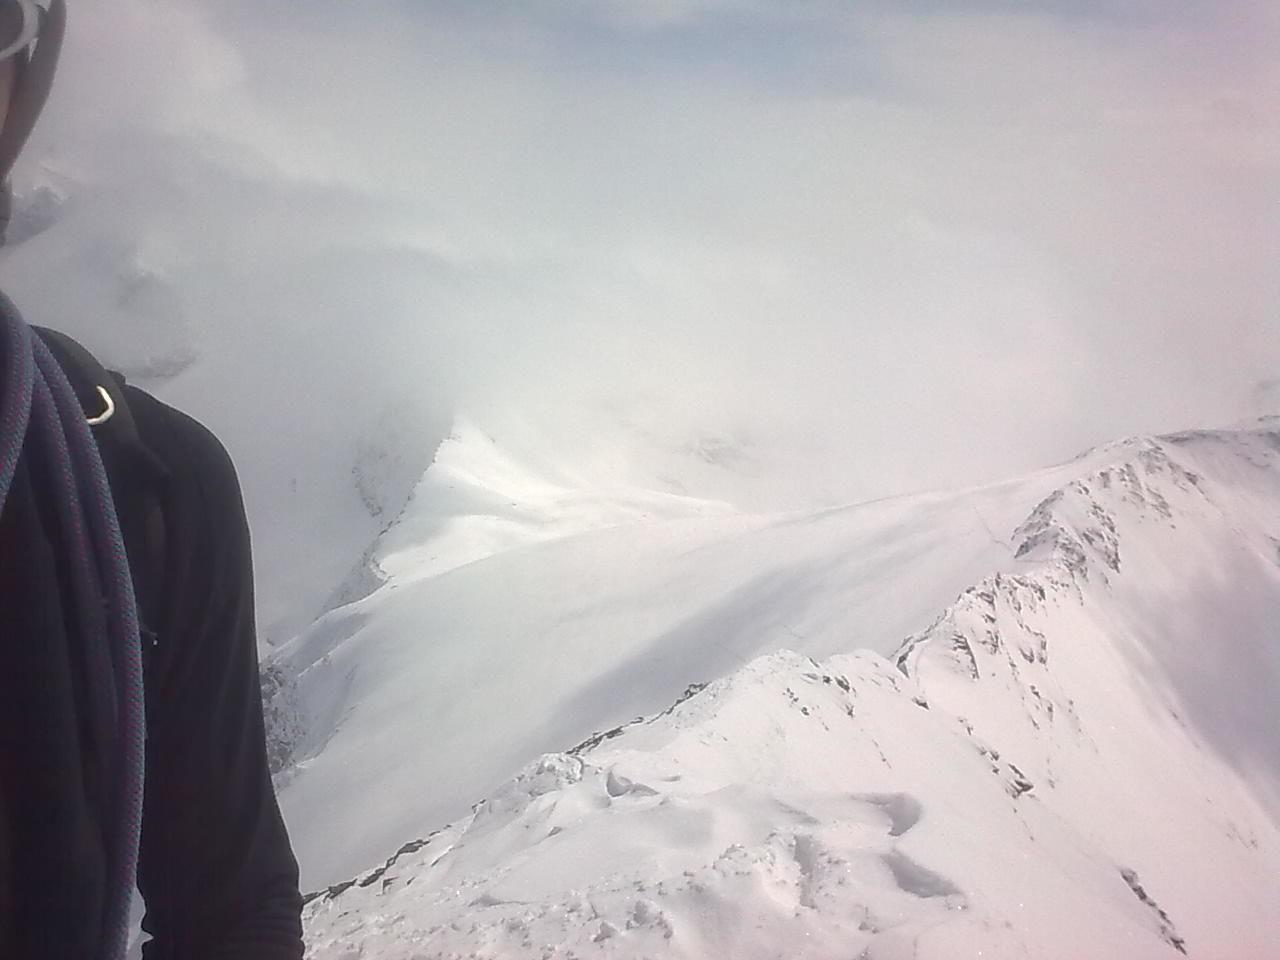 arete S vue du sommet